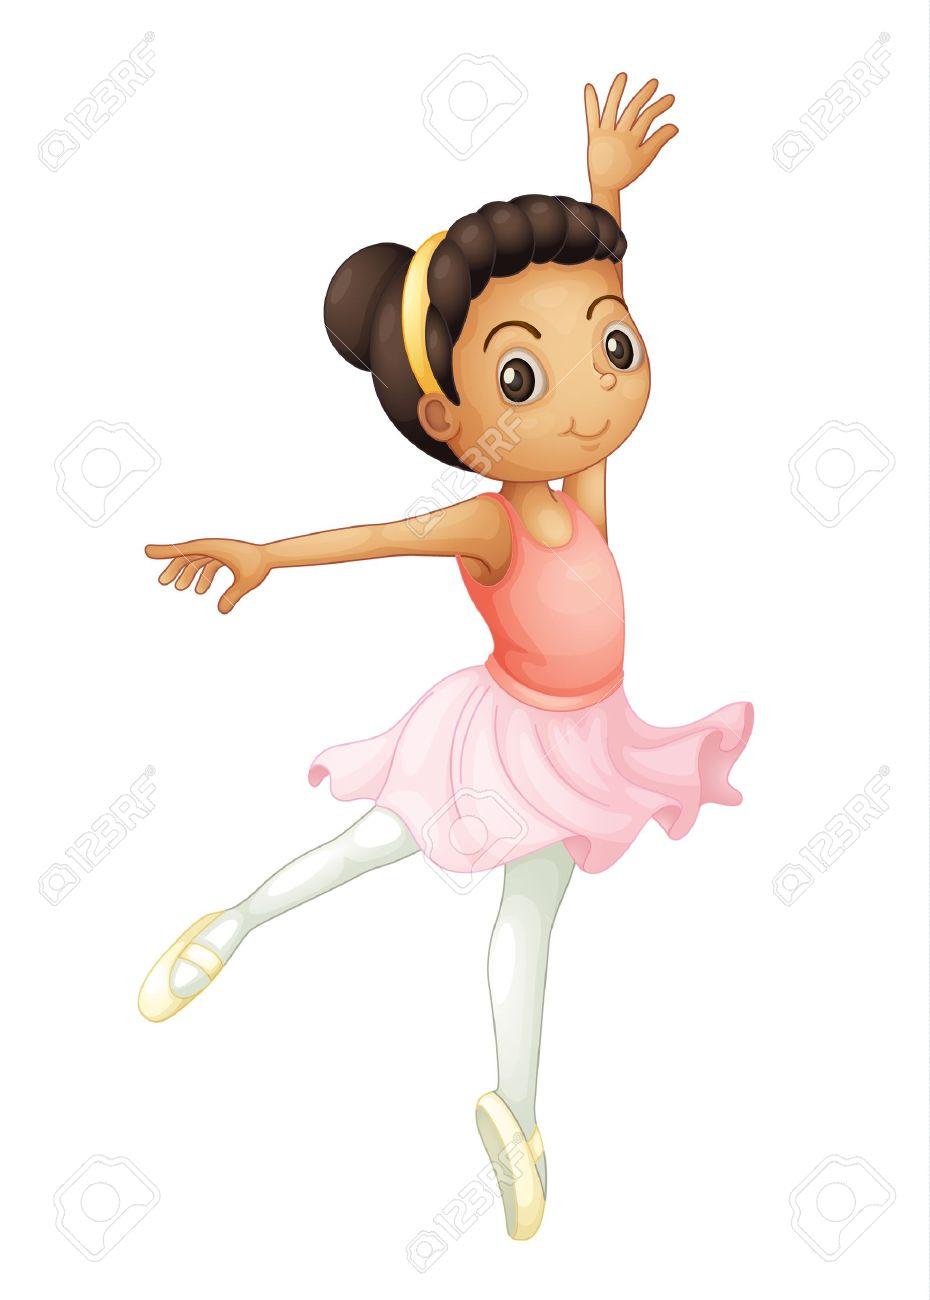 Clipart girl dancing banner free download Girl dancing clipart 9 » Clipart Station banner free download